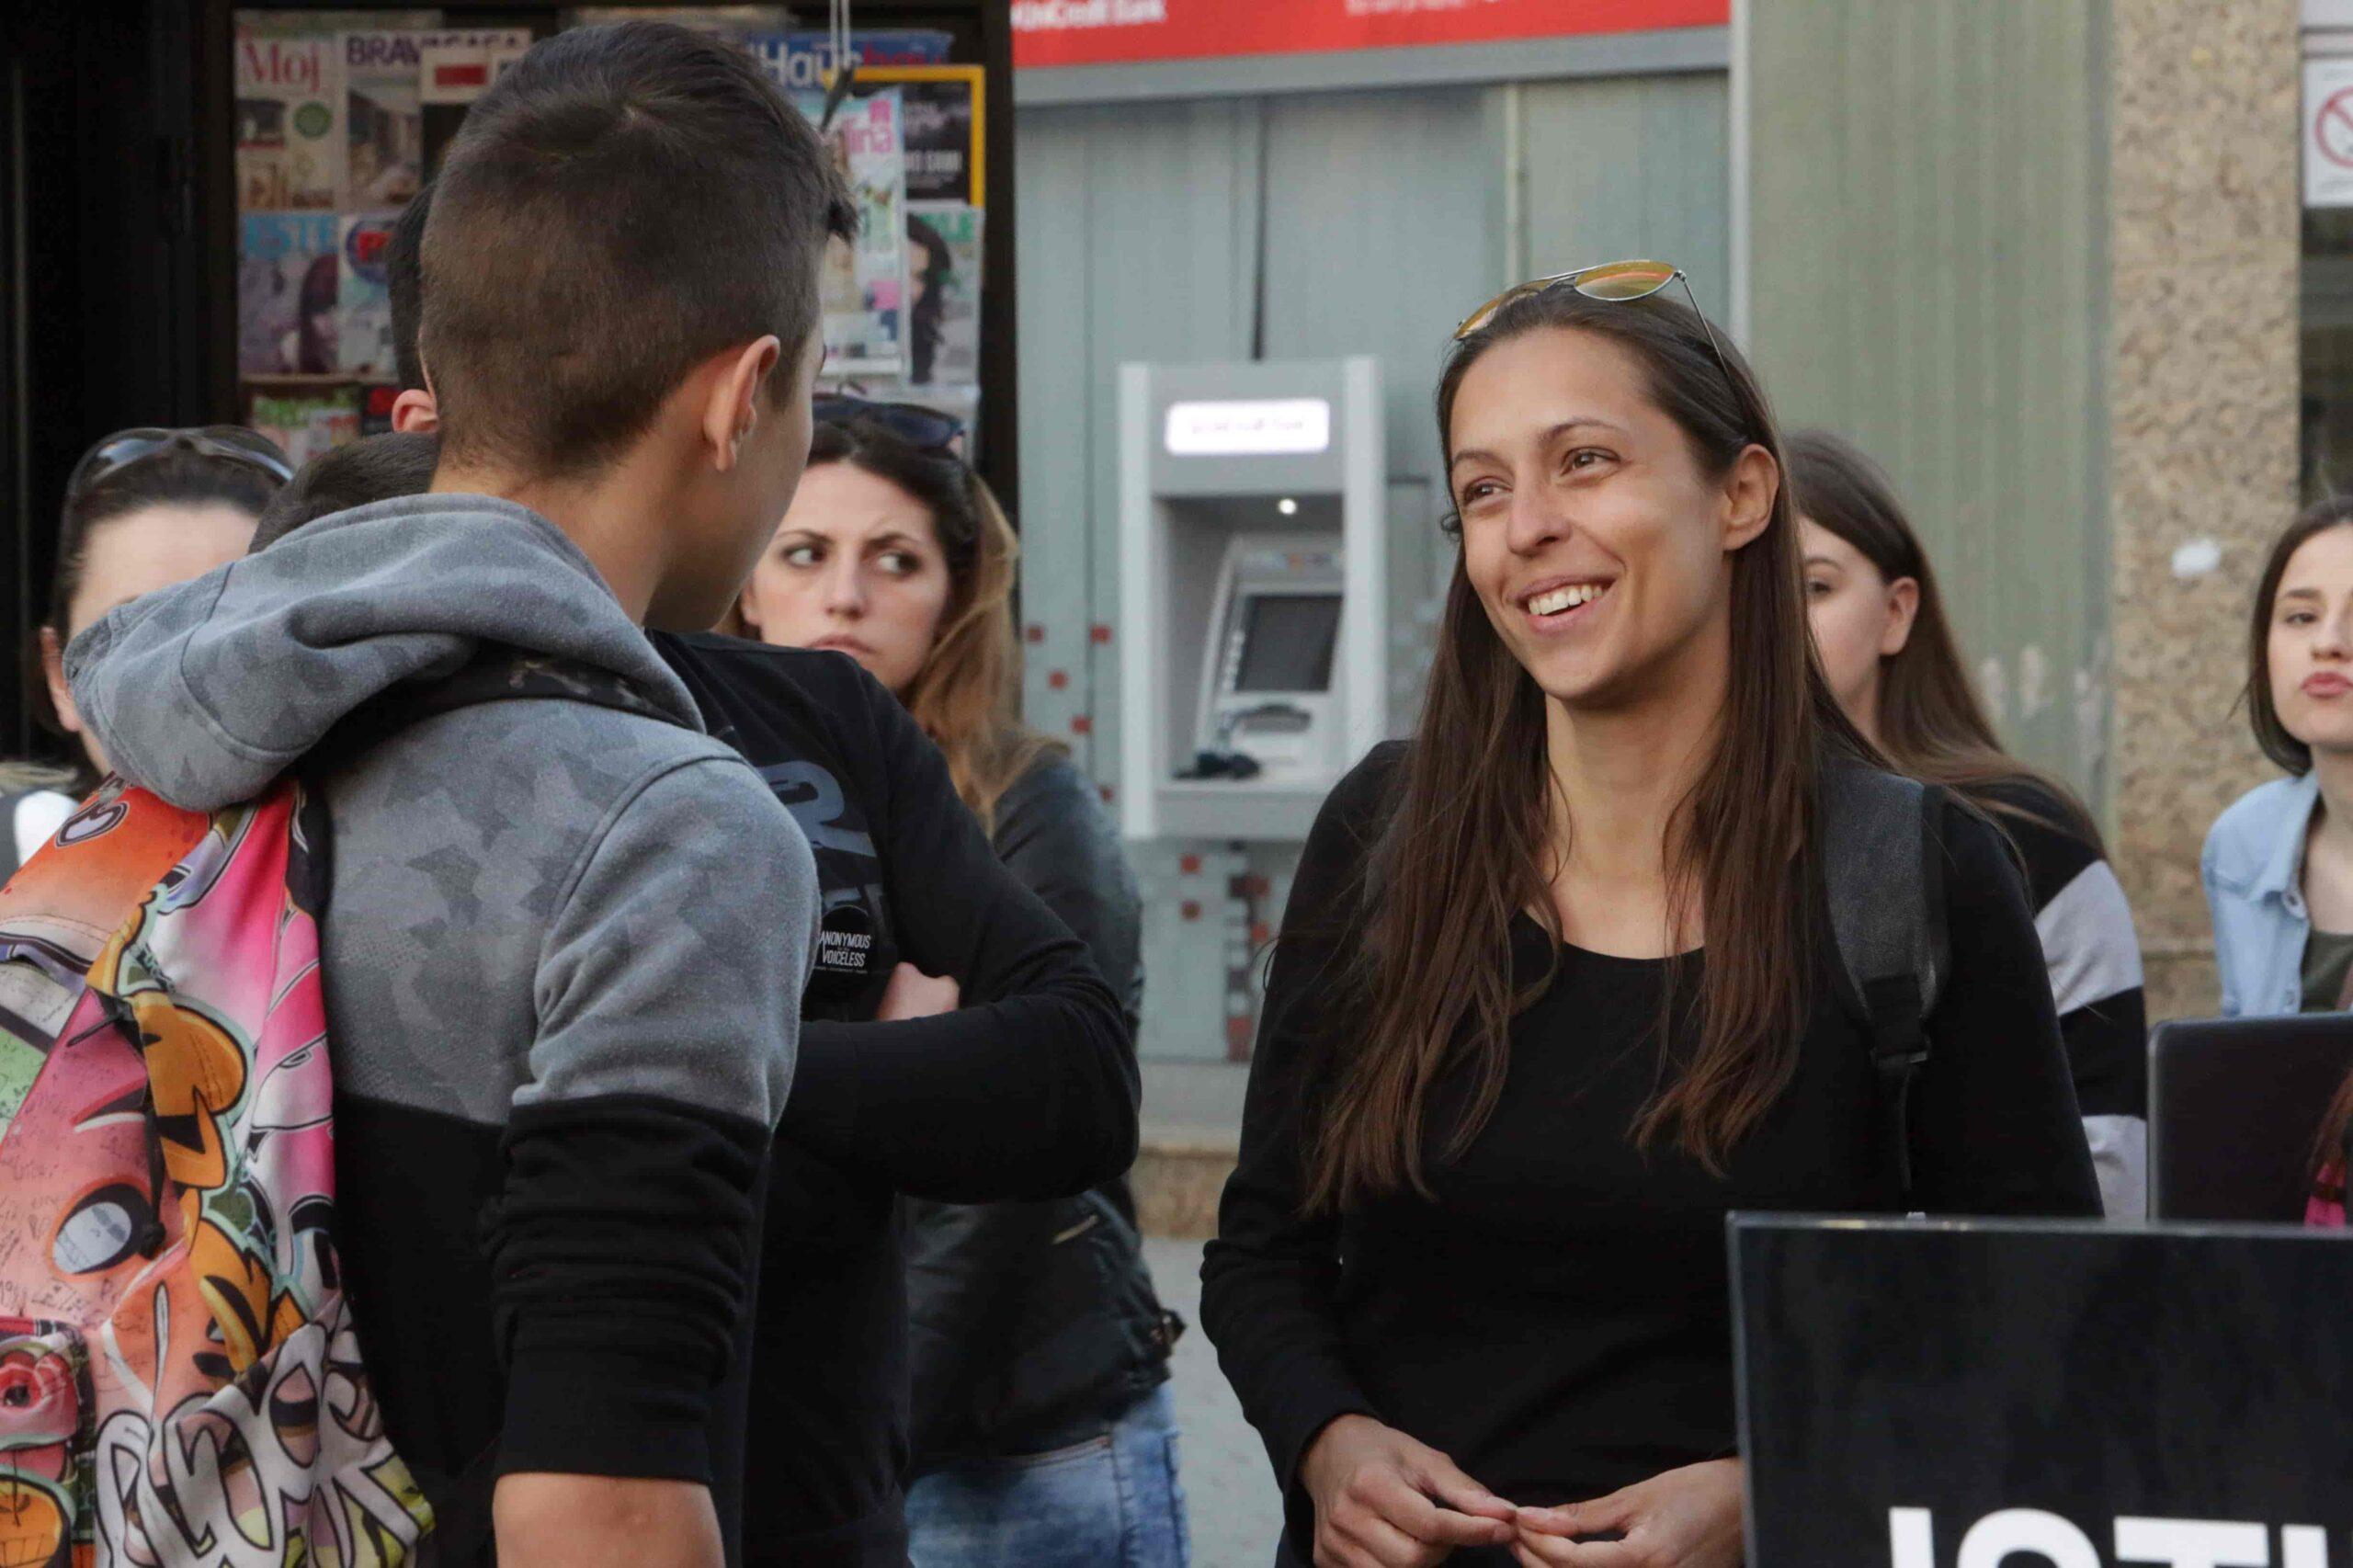 Ivana founder of Serbian vegan community Veganizmija